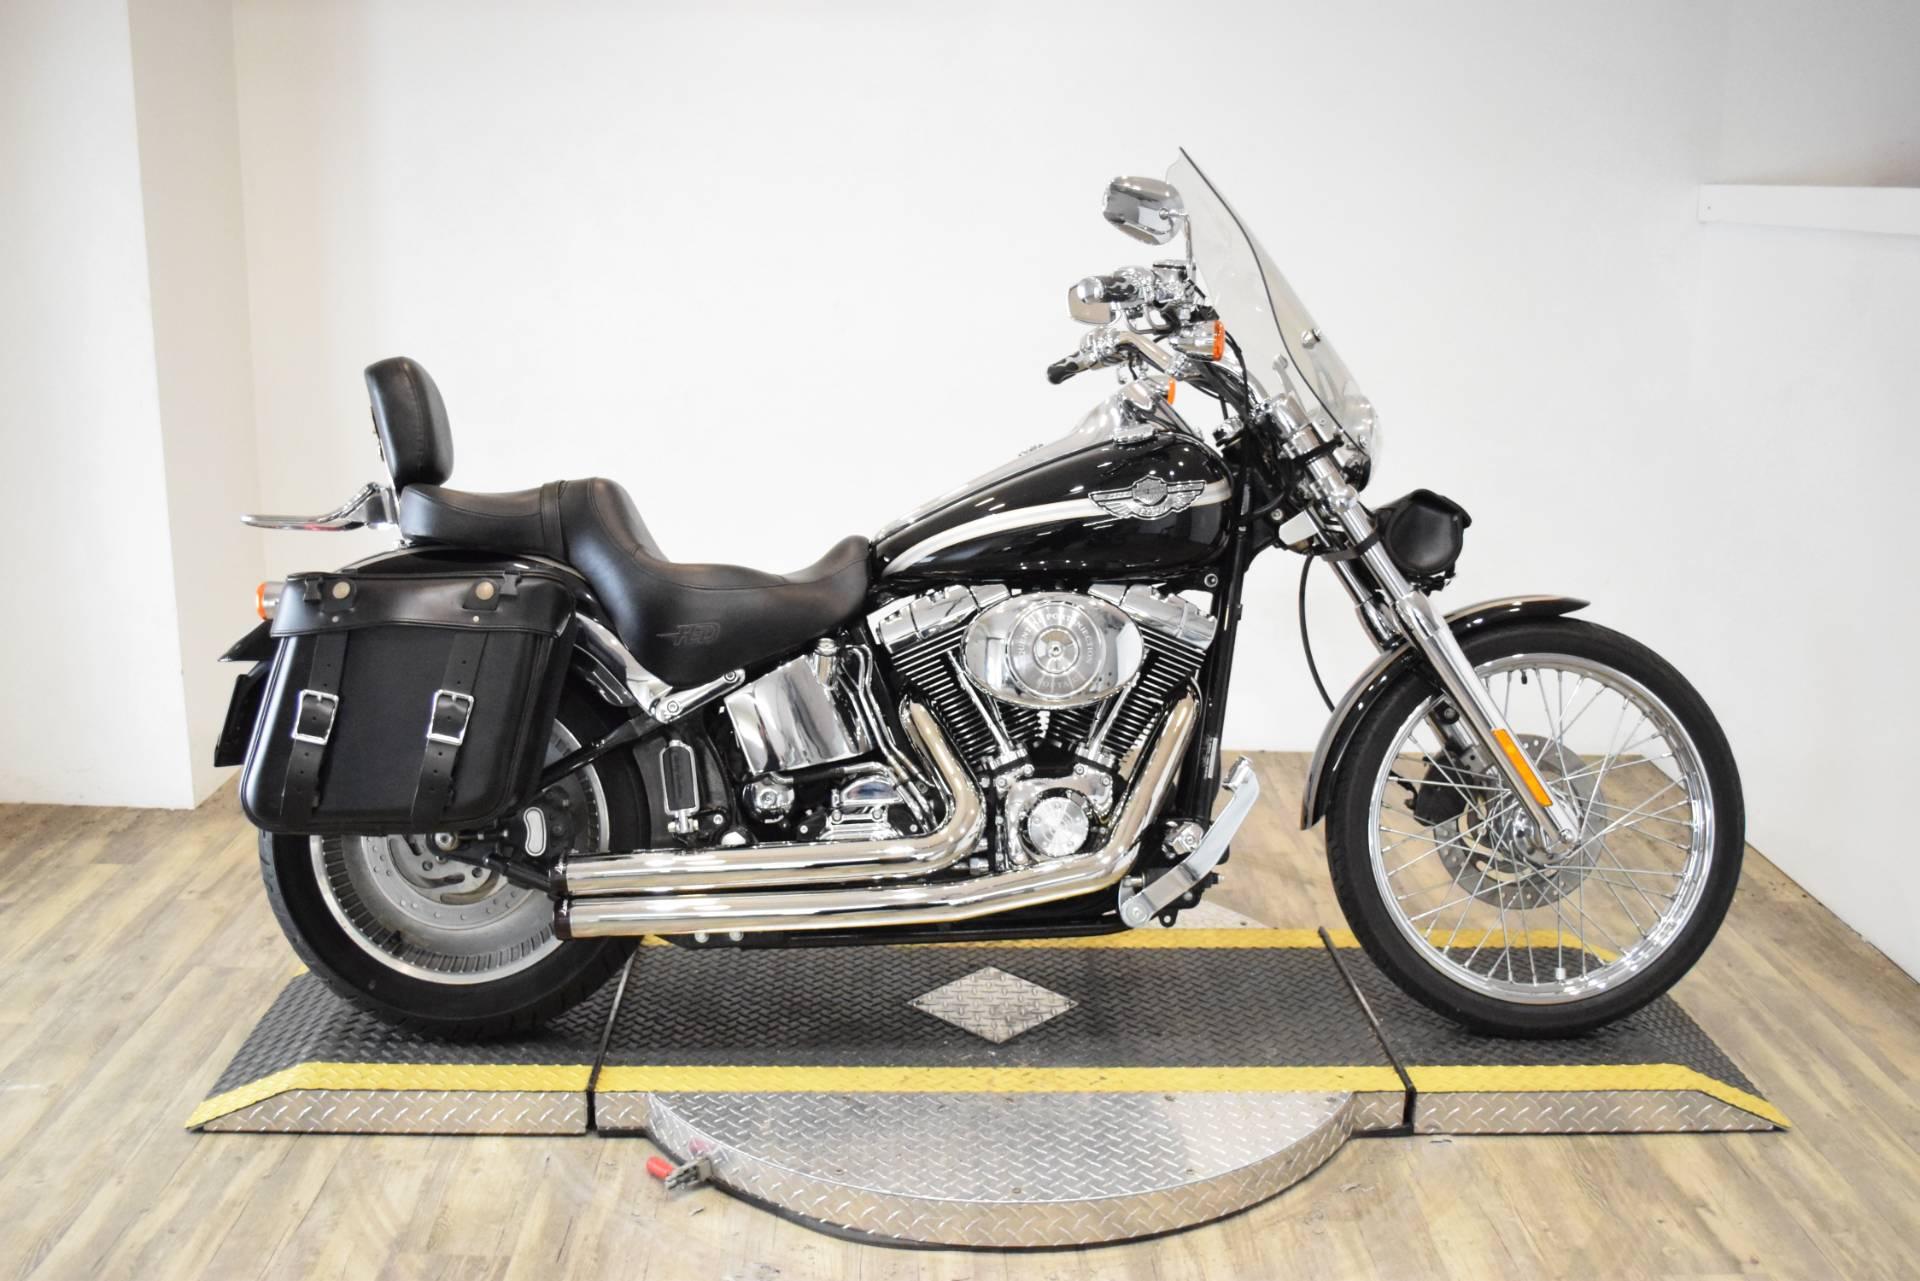 Harley Davidson Deuce >> 2003 Harley Davidson Fxstd Fxstdi Softail Deuce In Wauconda Illinois